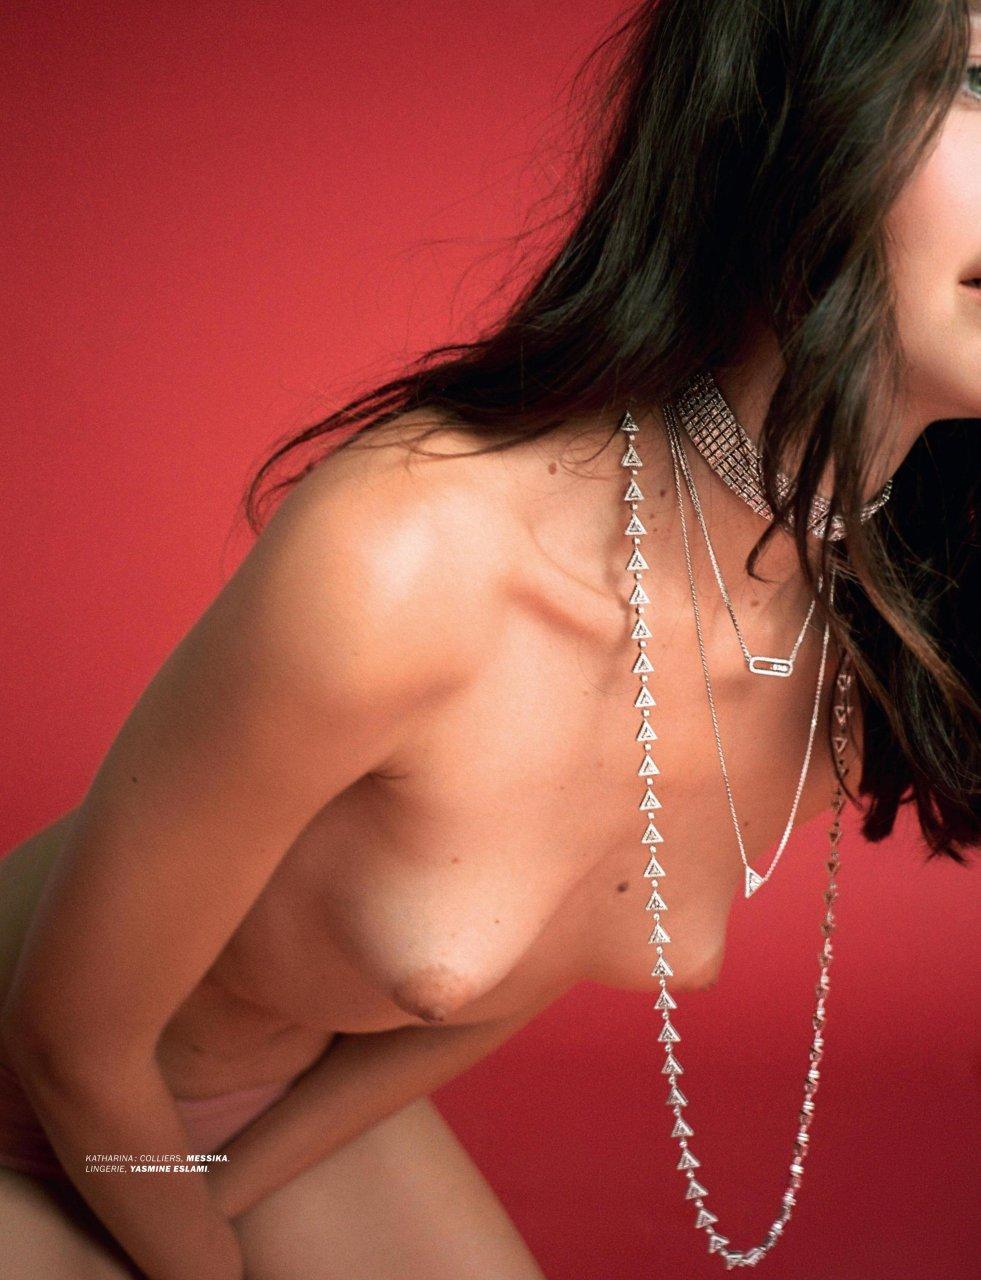 nudes (45 photos), Paparazzi Celebrity photo